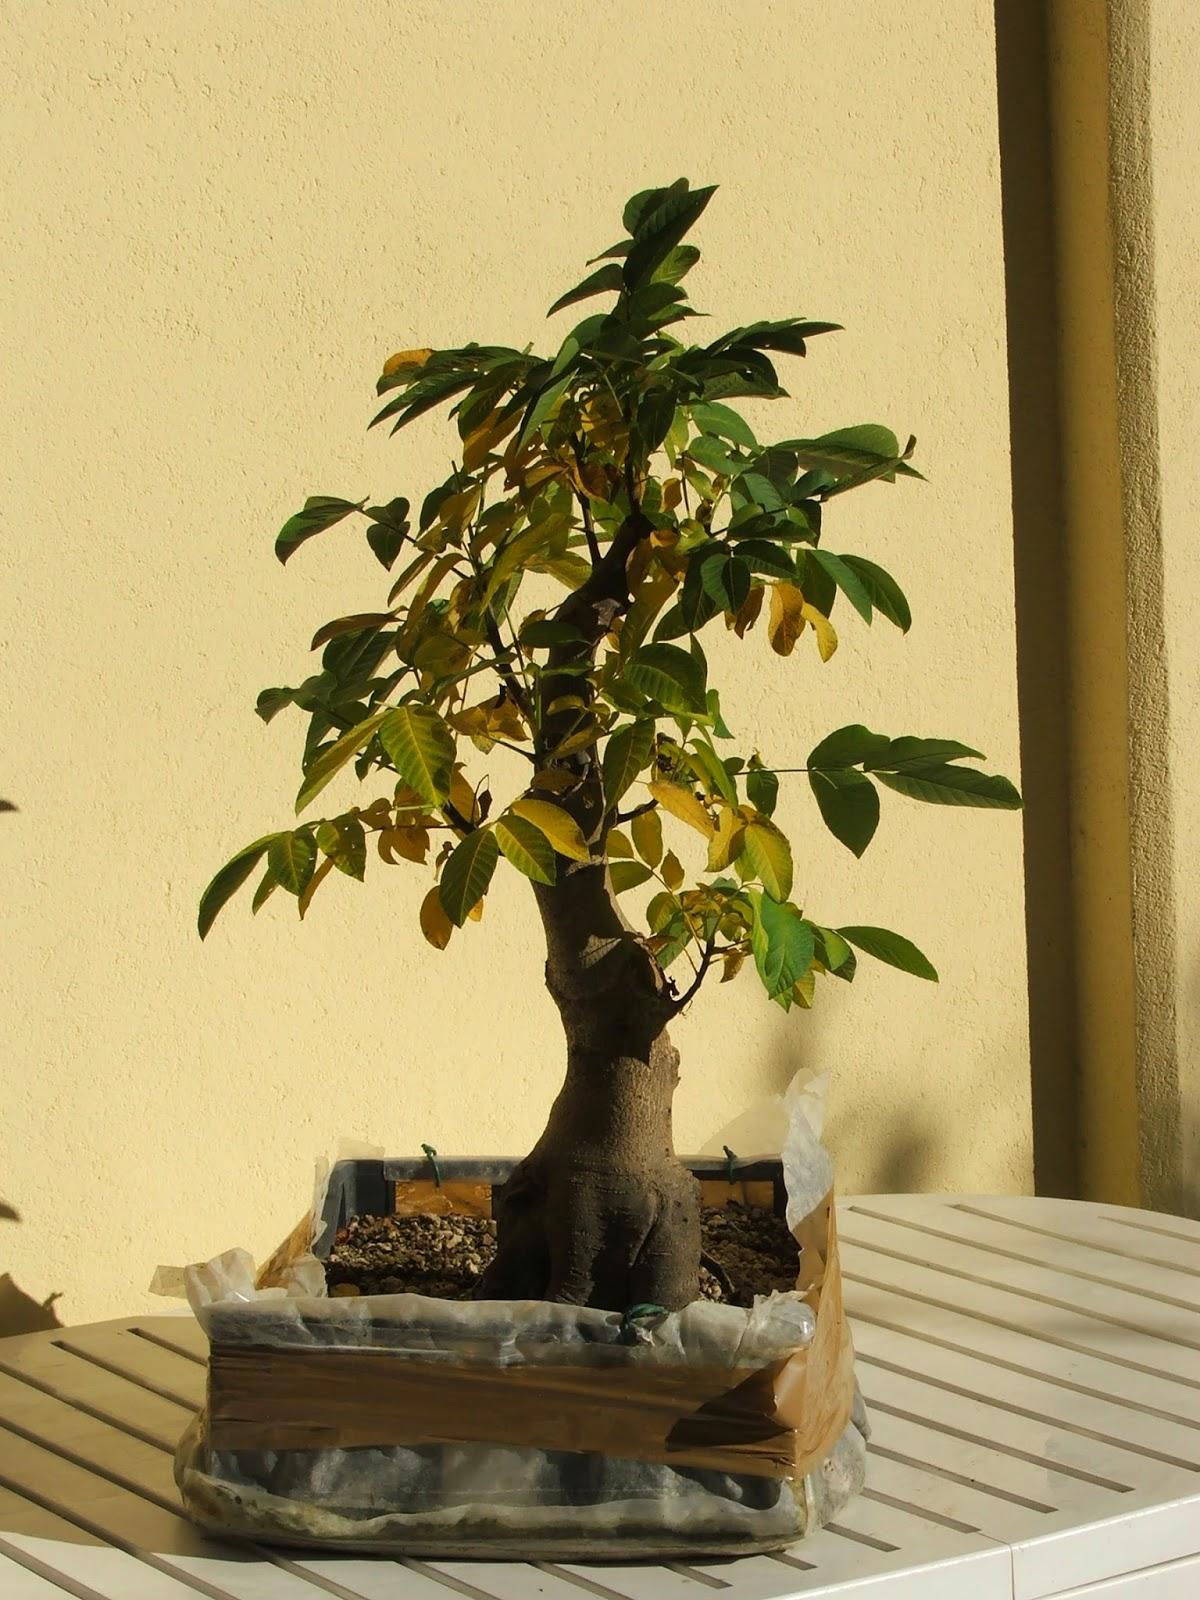 http://evoluzionebonsai.blogspot.it/2014/08/bonsai-di-noce-juglans-regia-walnut.html